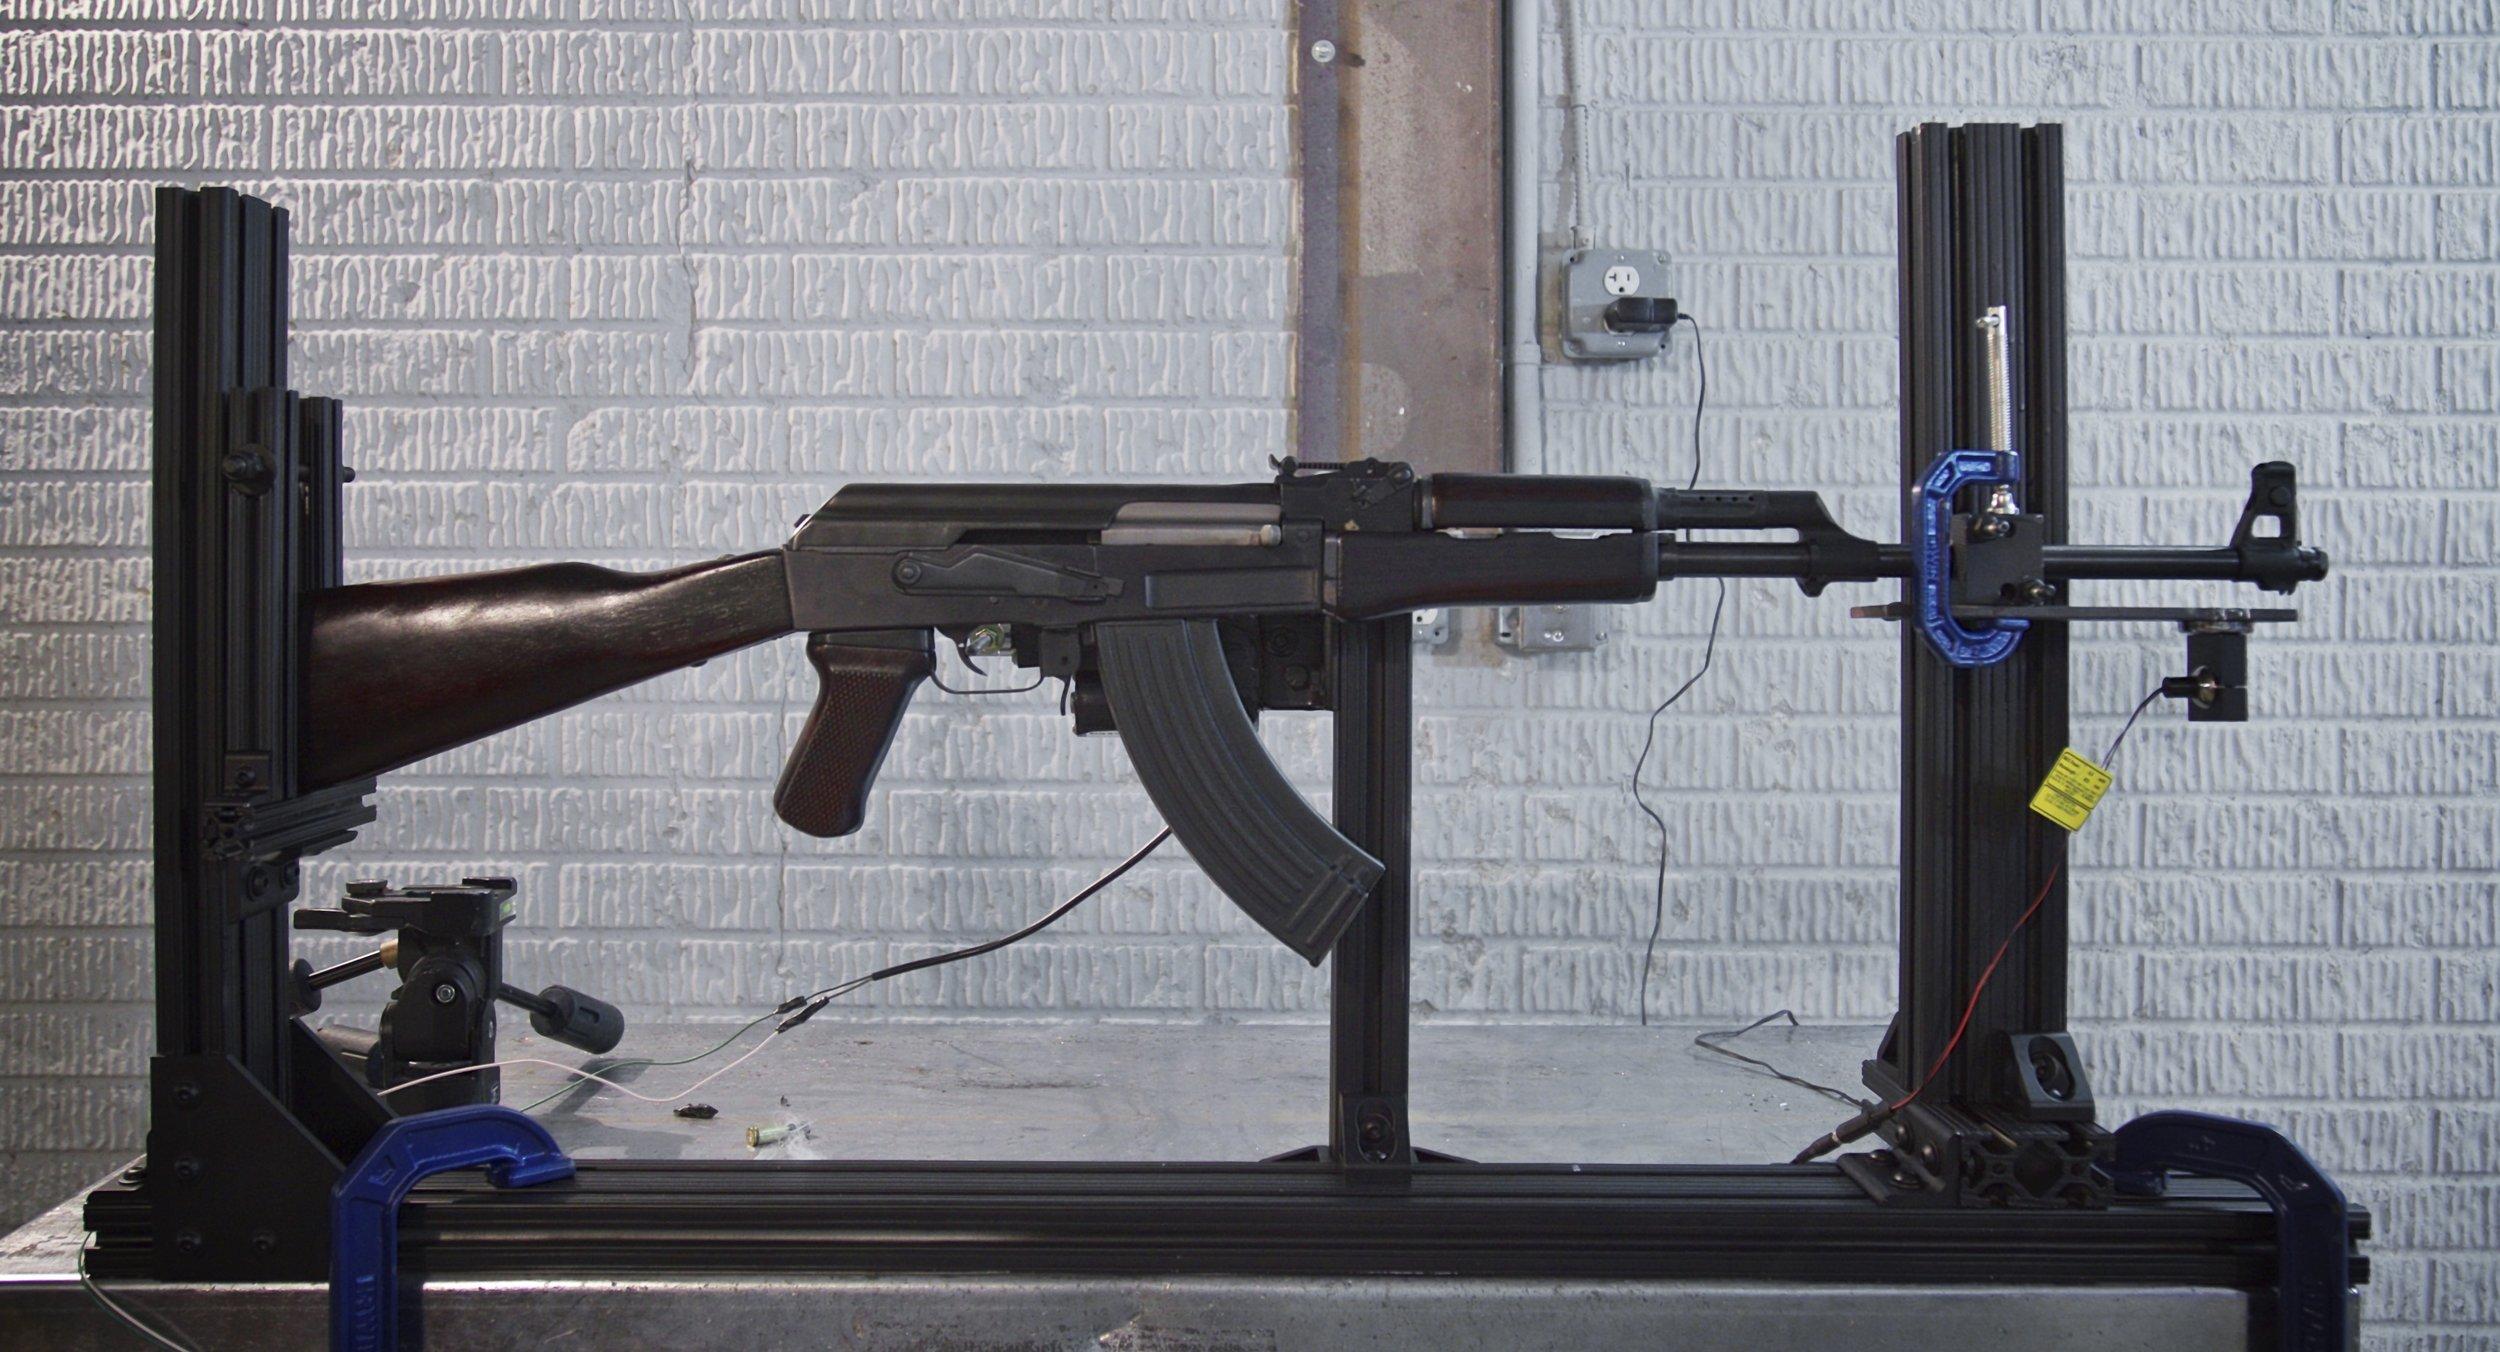 AK-47 used during ballistic testing, 2015